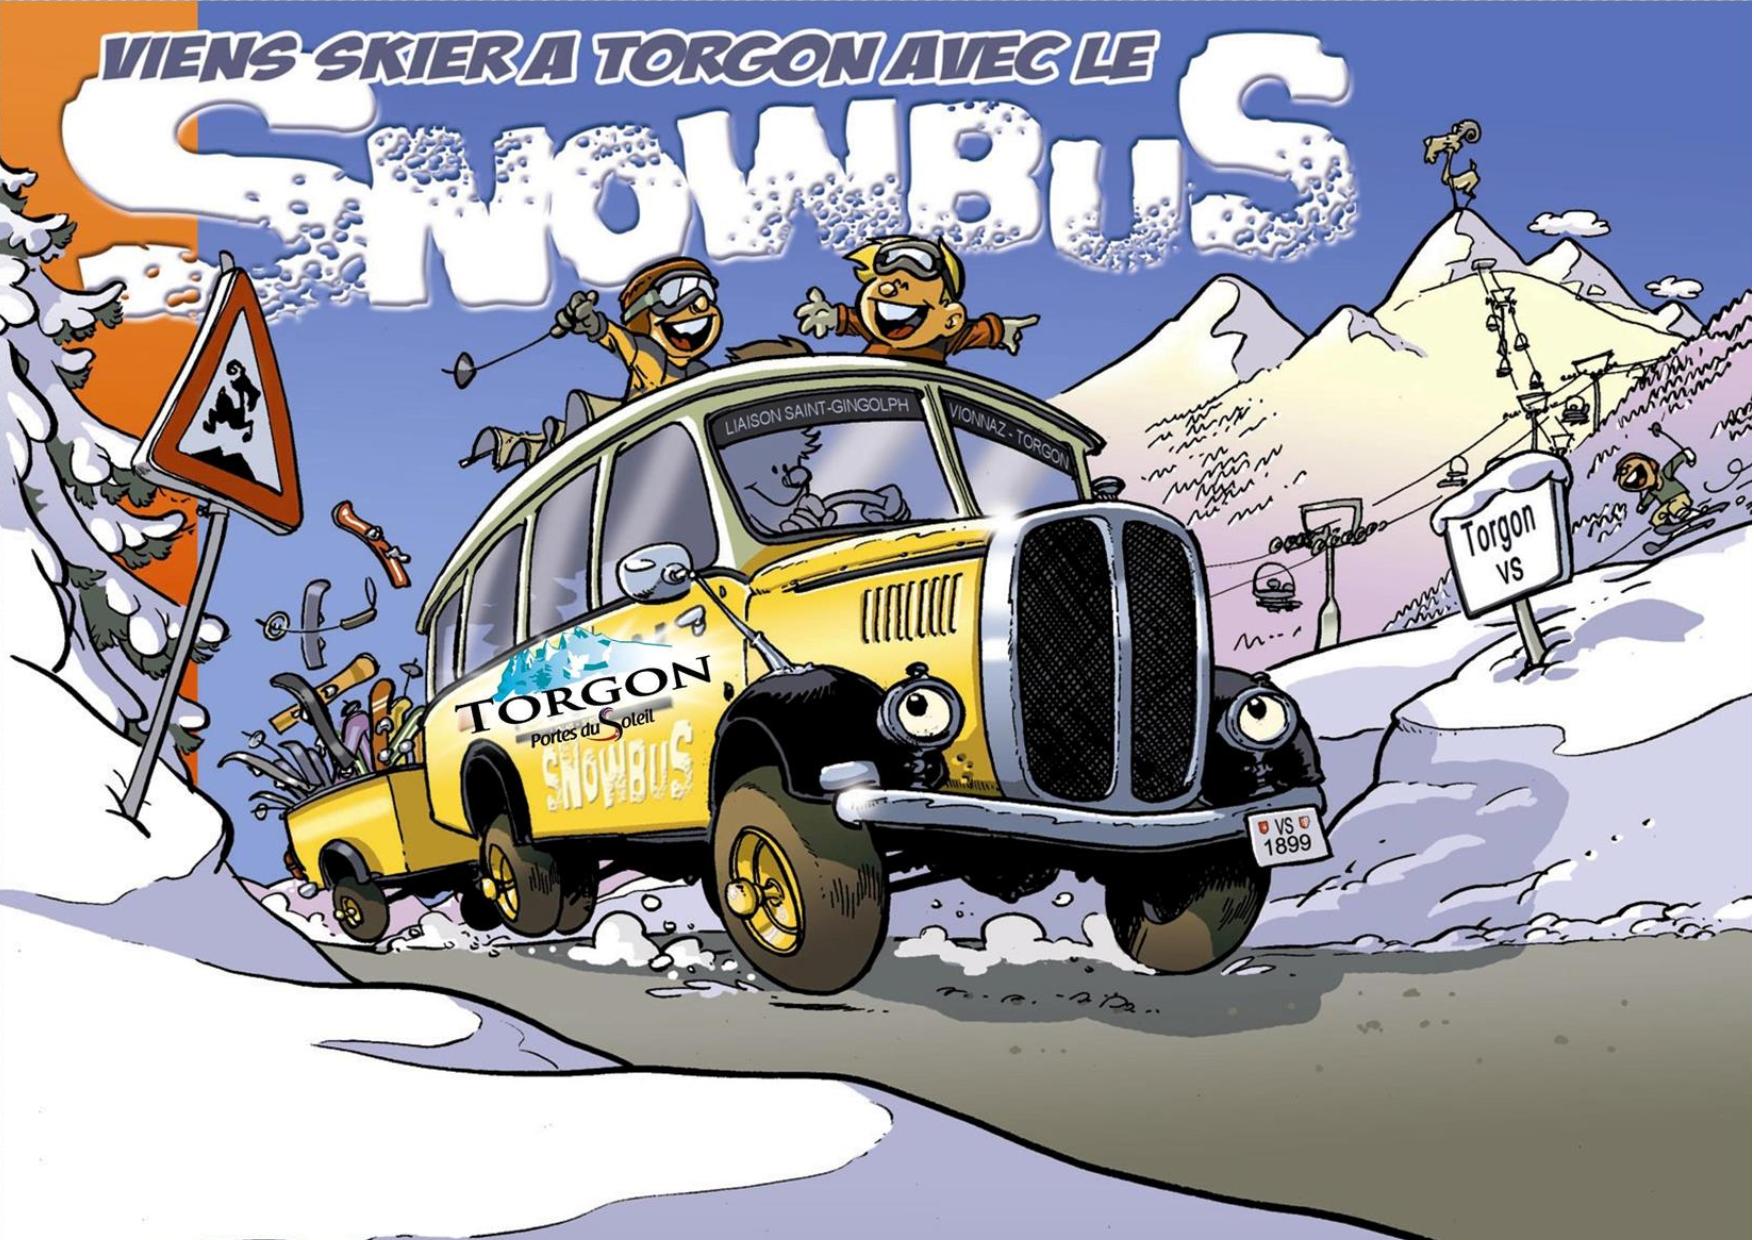 Le Torgon SnowBus @  |  |